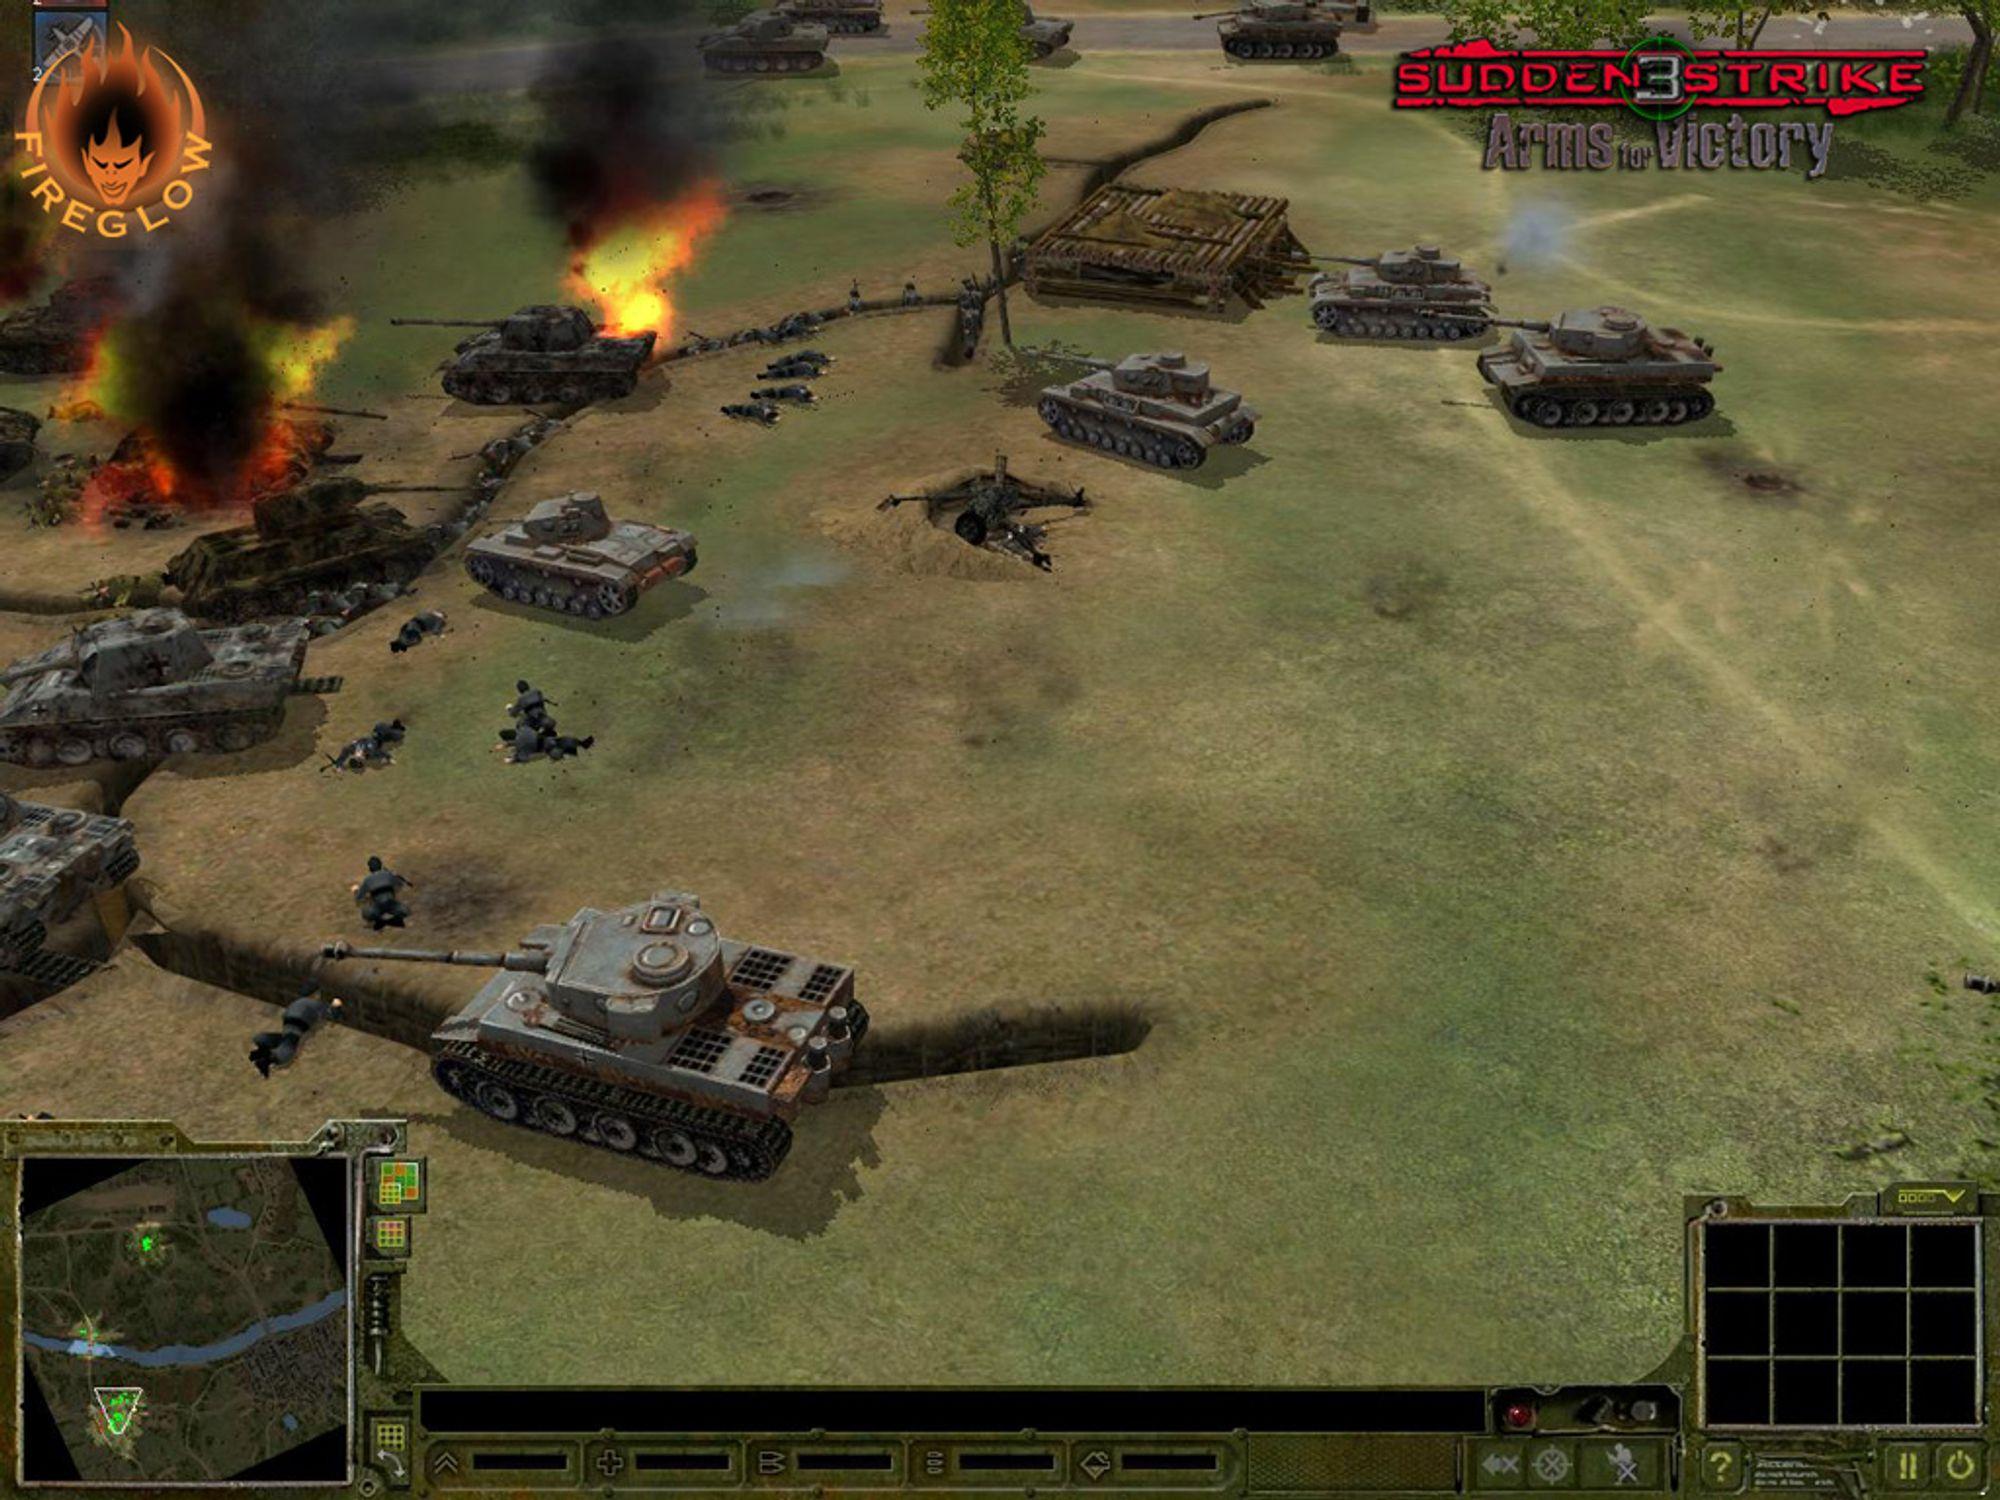 Sudden Strike 3: Arms for Victory Archiv - Screenshots - Bild 26.